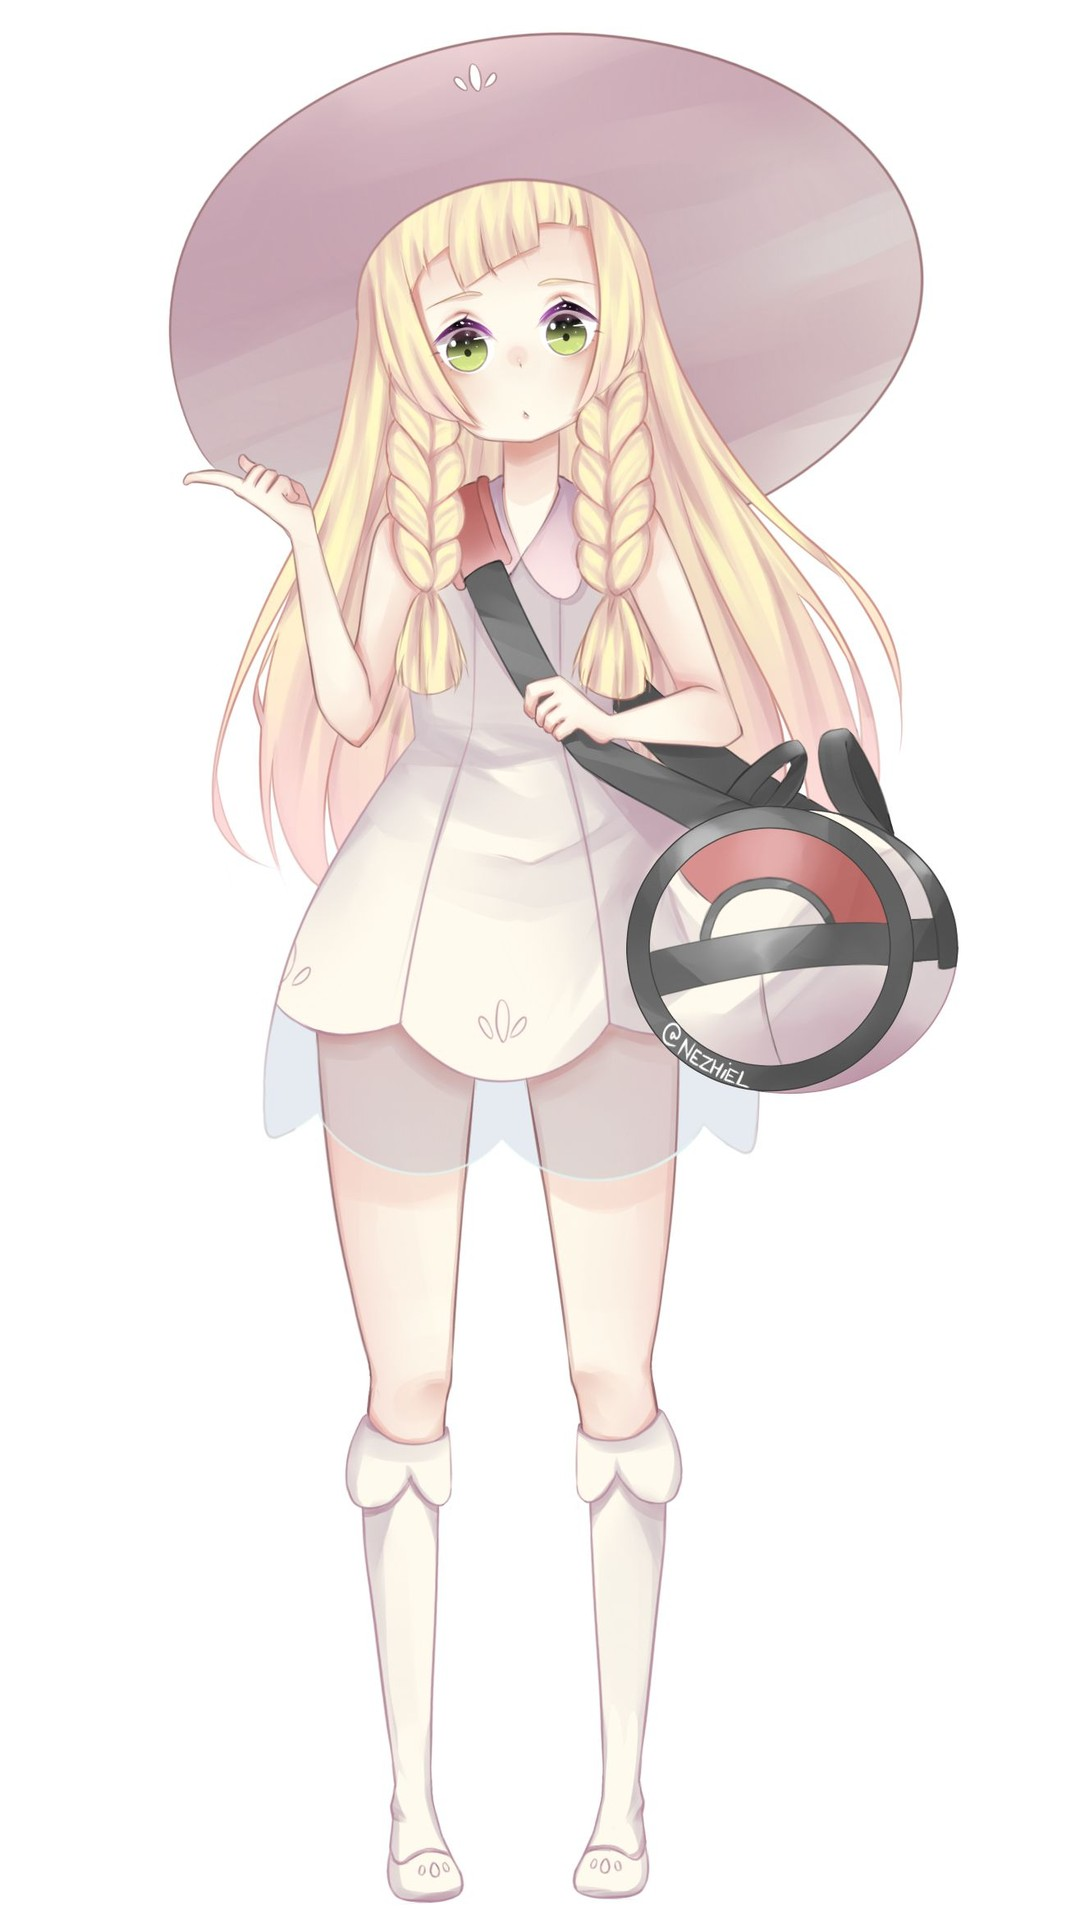 lillie_(pokemon)090